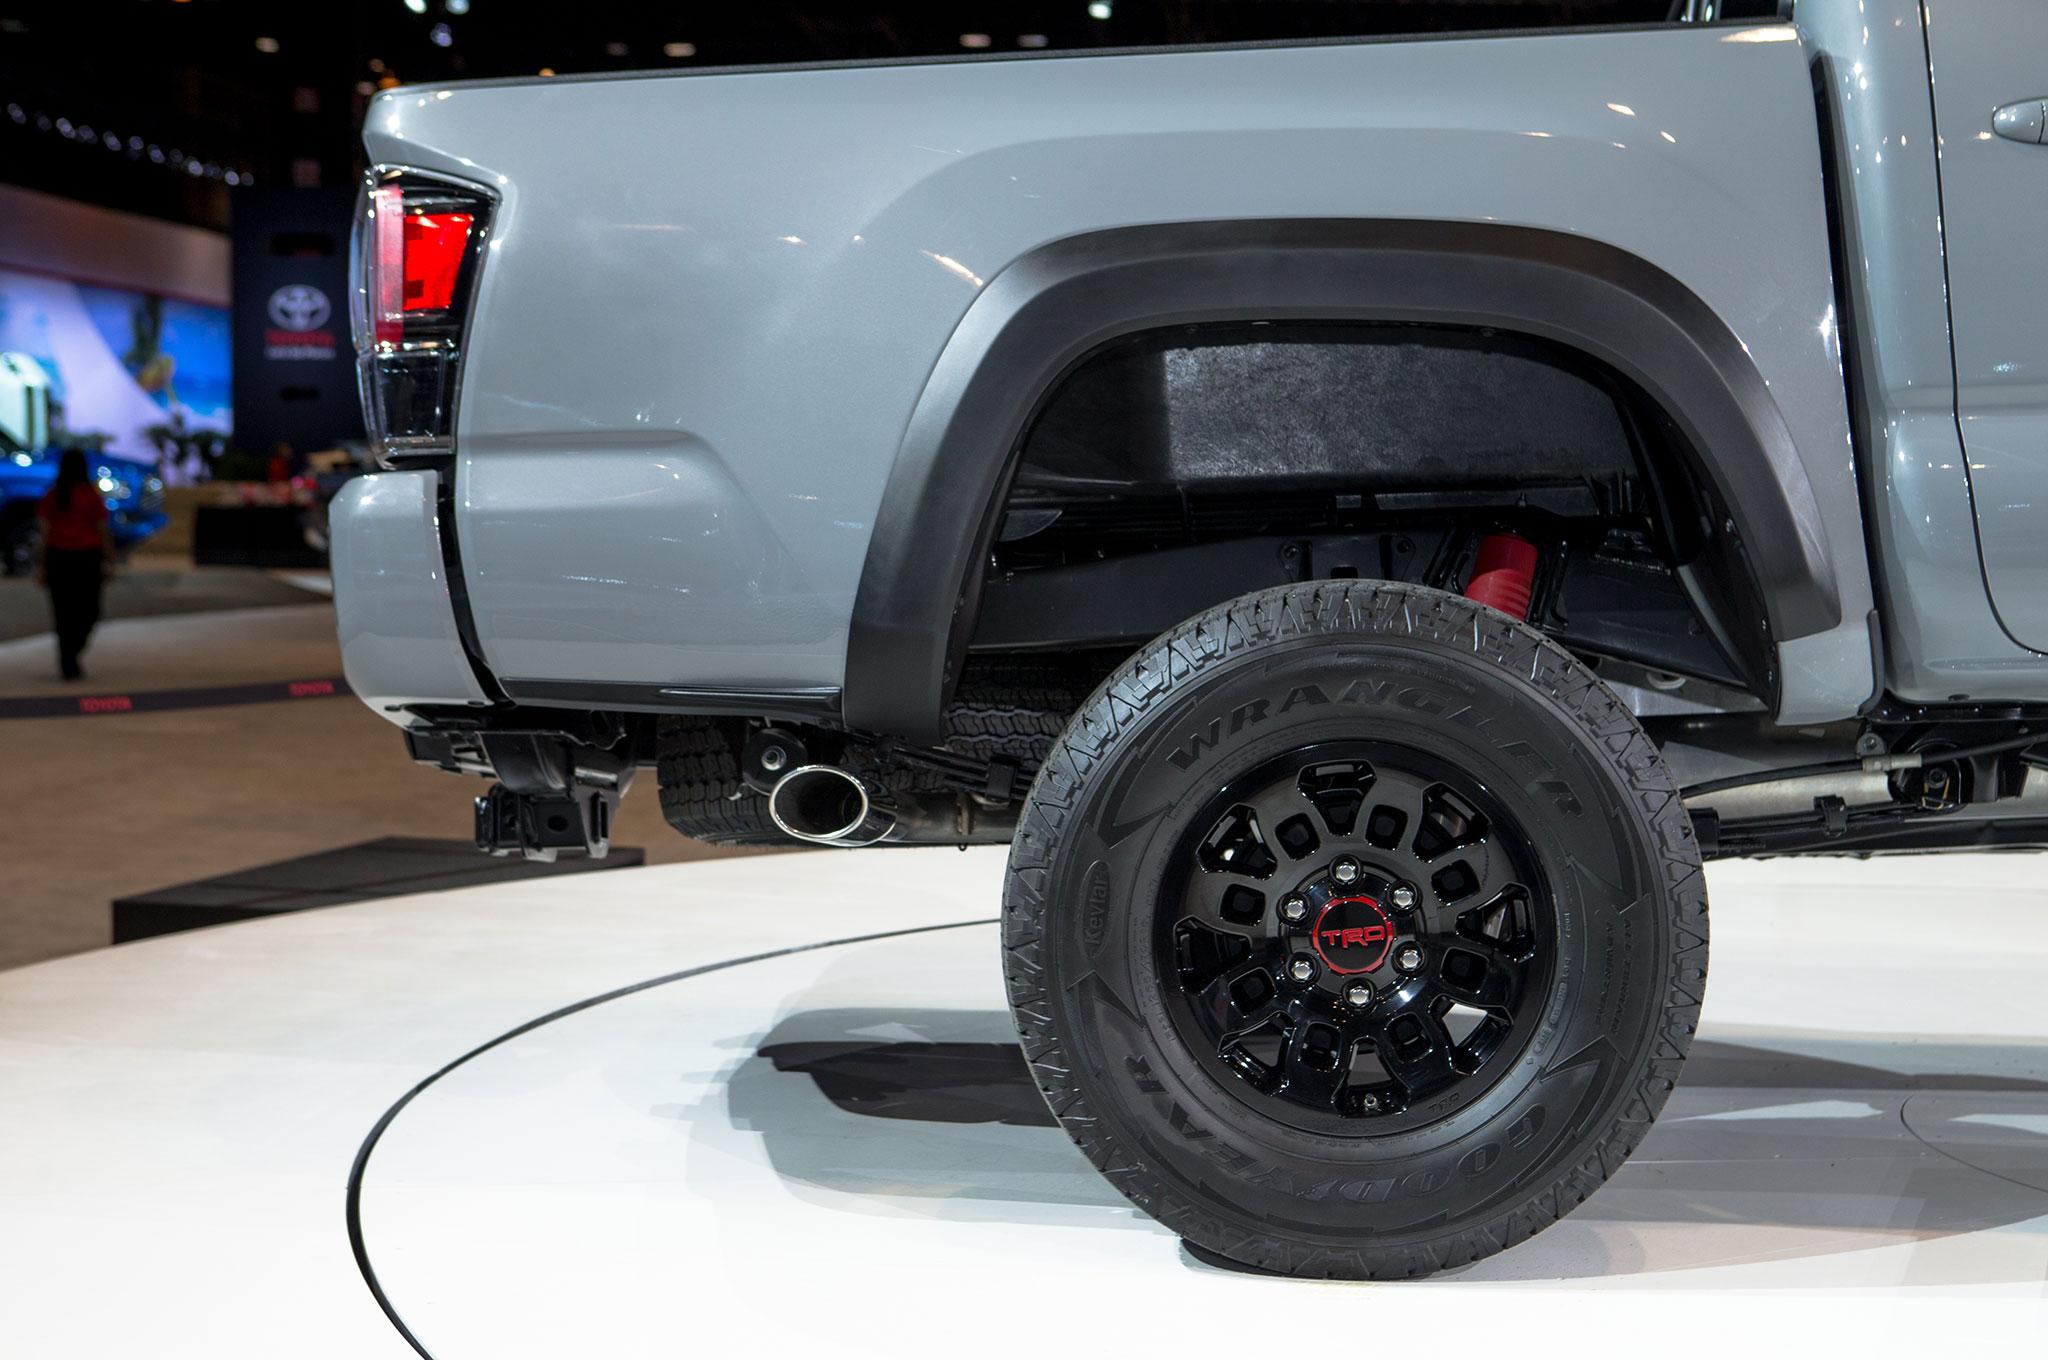 2016 Chicago Auto Show Hits Misses Revelations